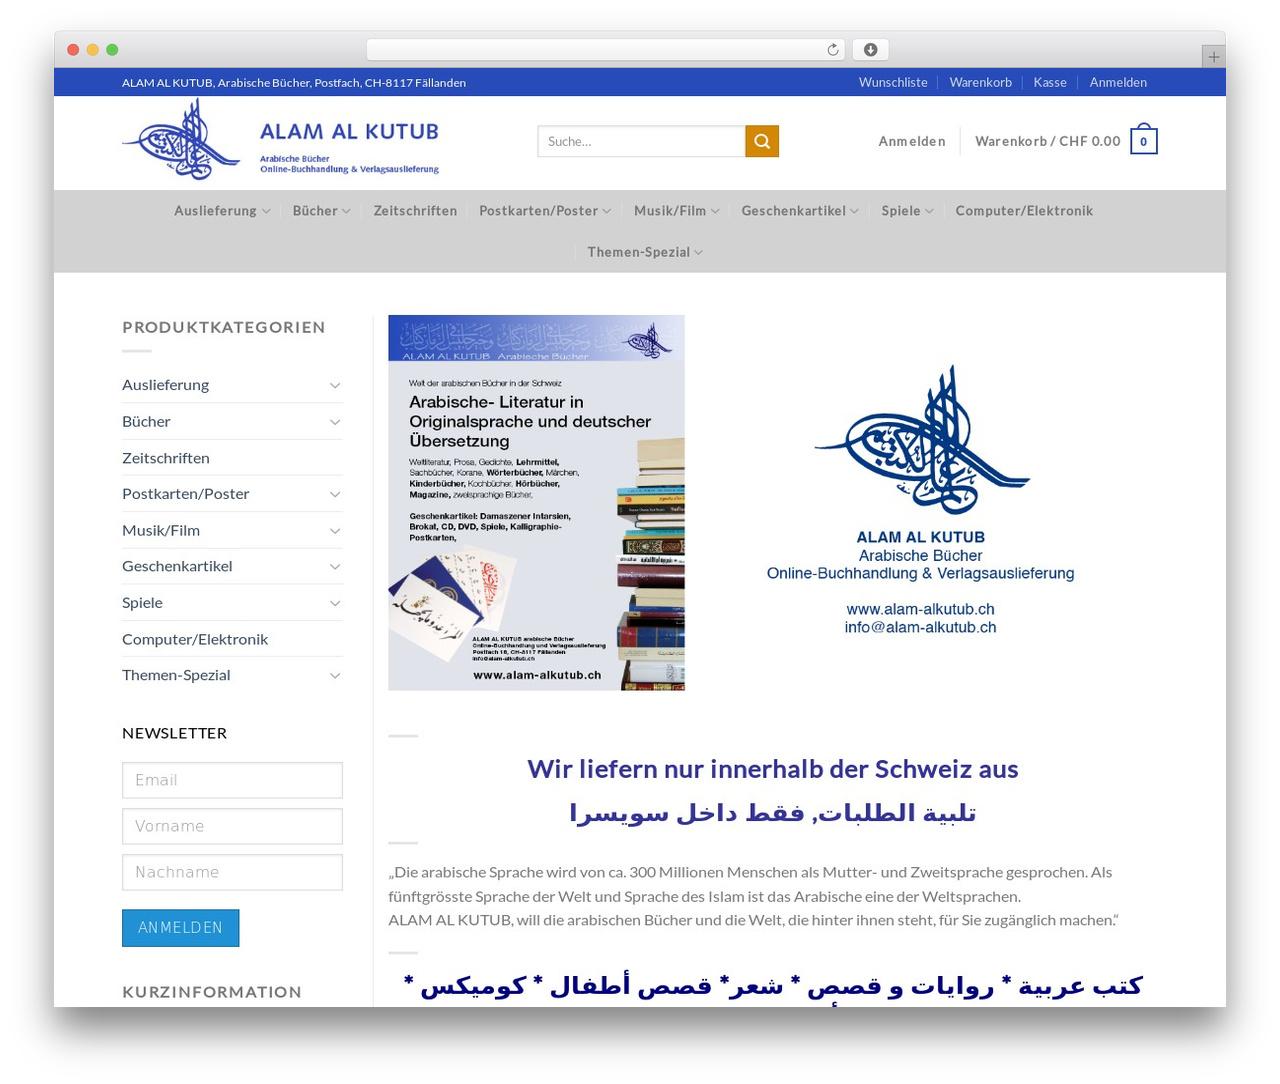 WordPress theme Flatsome - alam-alkutub.ch